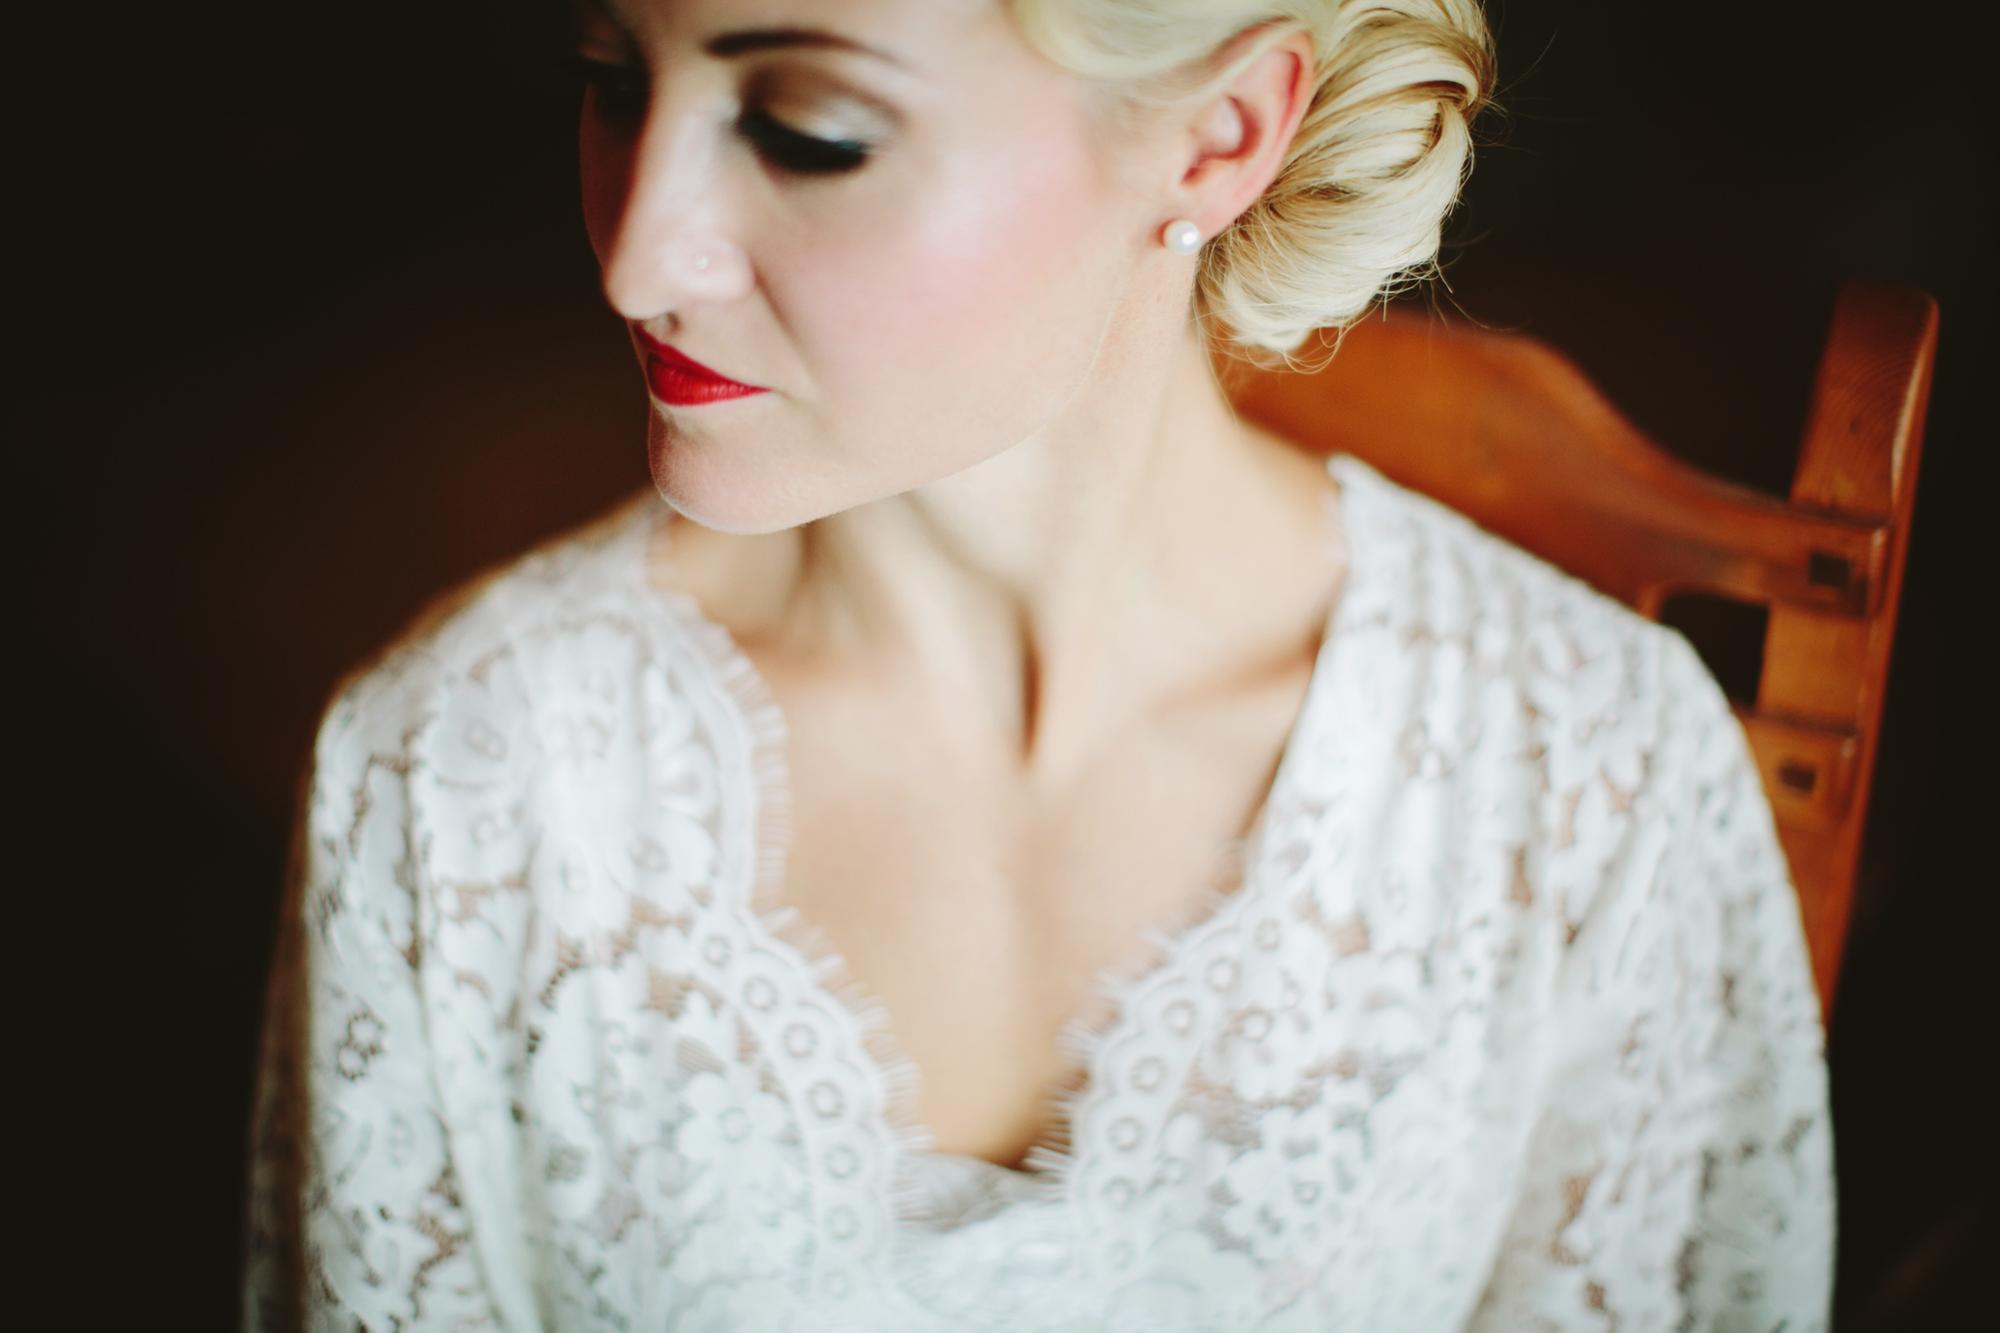 mountain wedding, lake wedding, alberta wedding photographer, 30s hairstyle, vintage dress, bride getting ready